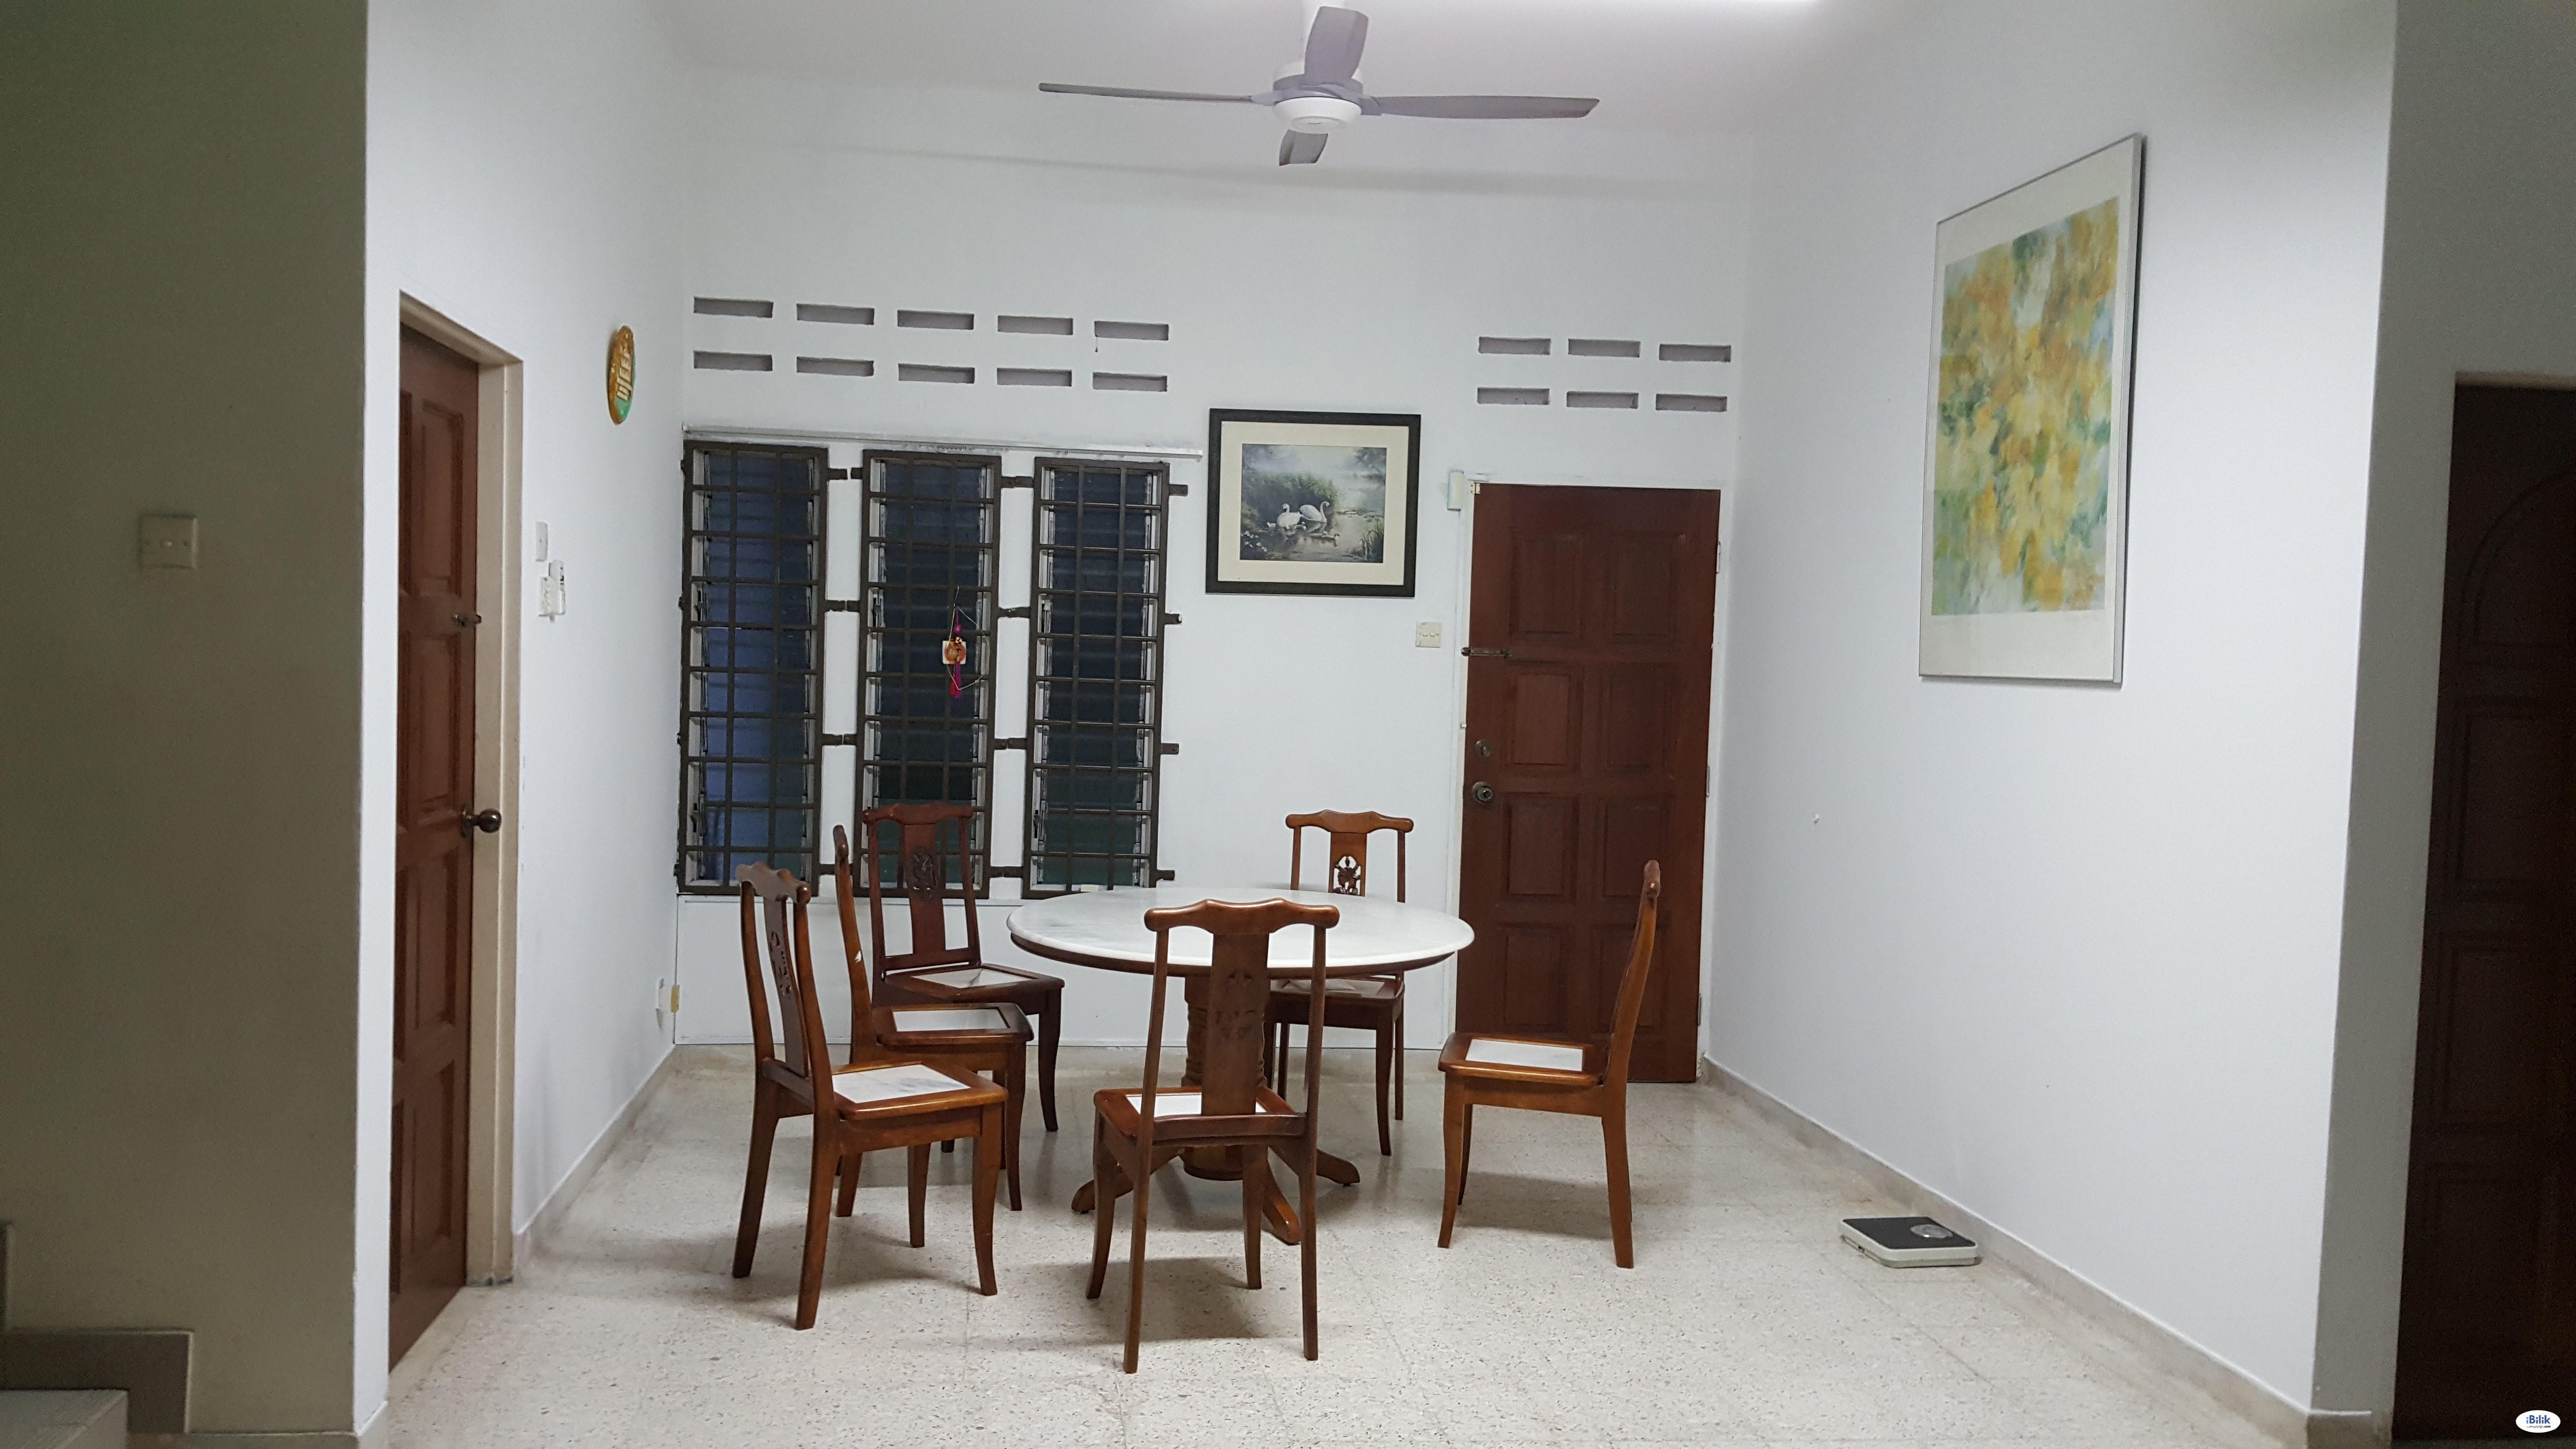 Seremban Master Room with Attached Bathroom To Let- Near Kemayan Sq, KPJ Hospital, Palm Mall, Gateway, HTJS